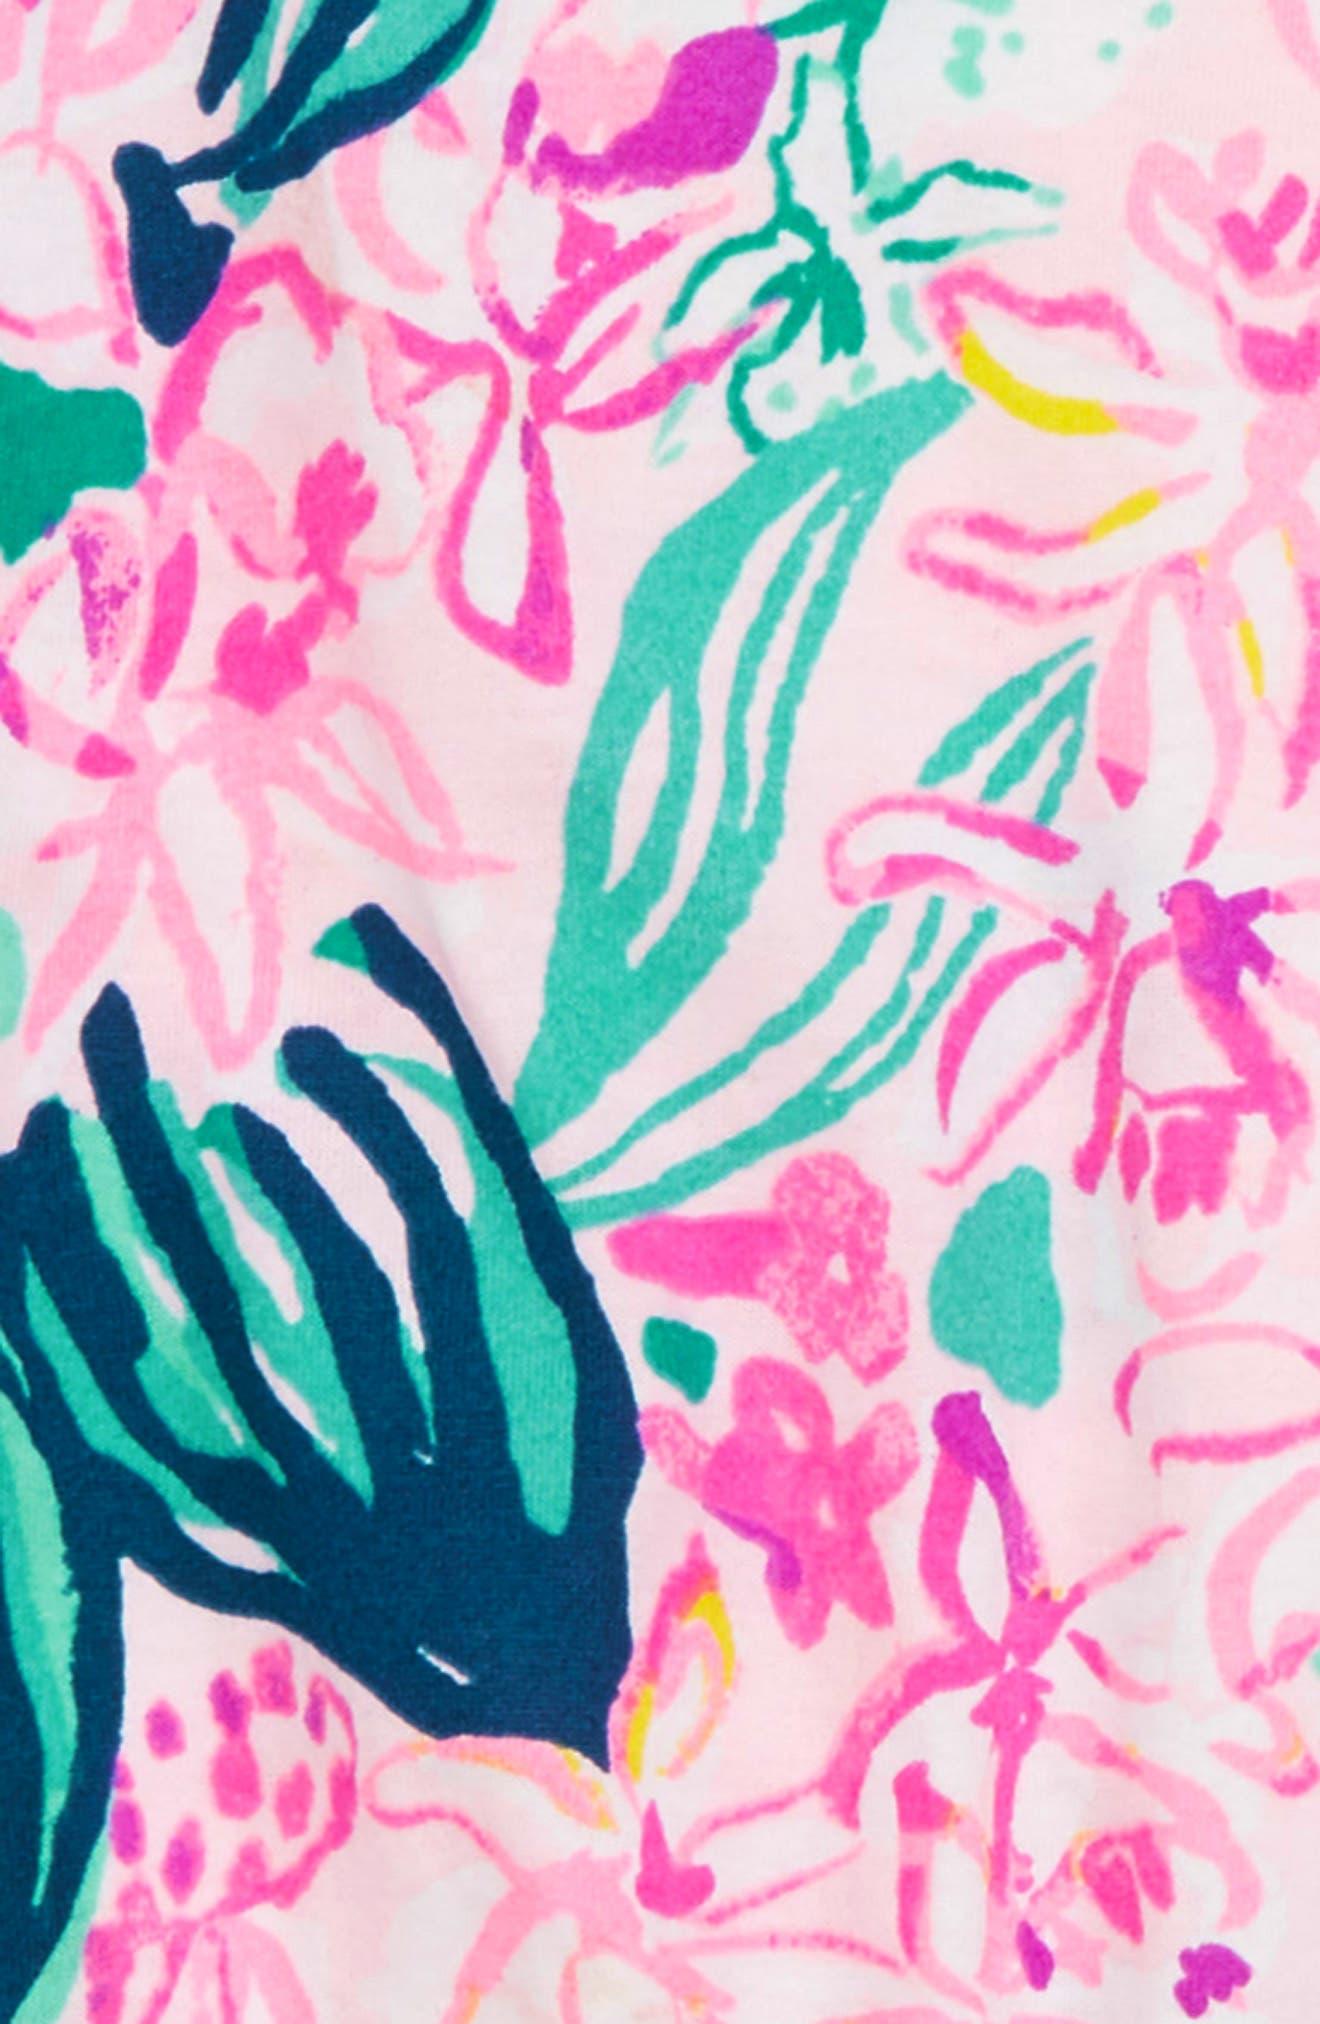 Camryn Tie Sleeve Romper,                             Alternate thumbnail 2, color,                             300